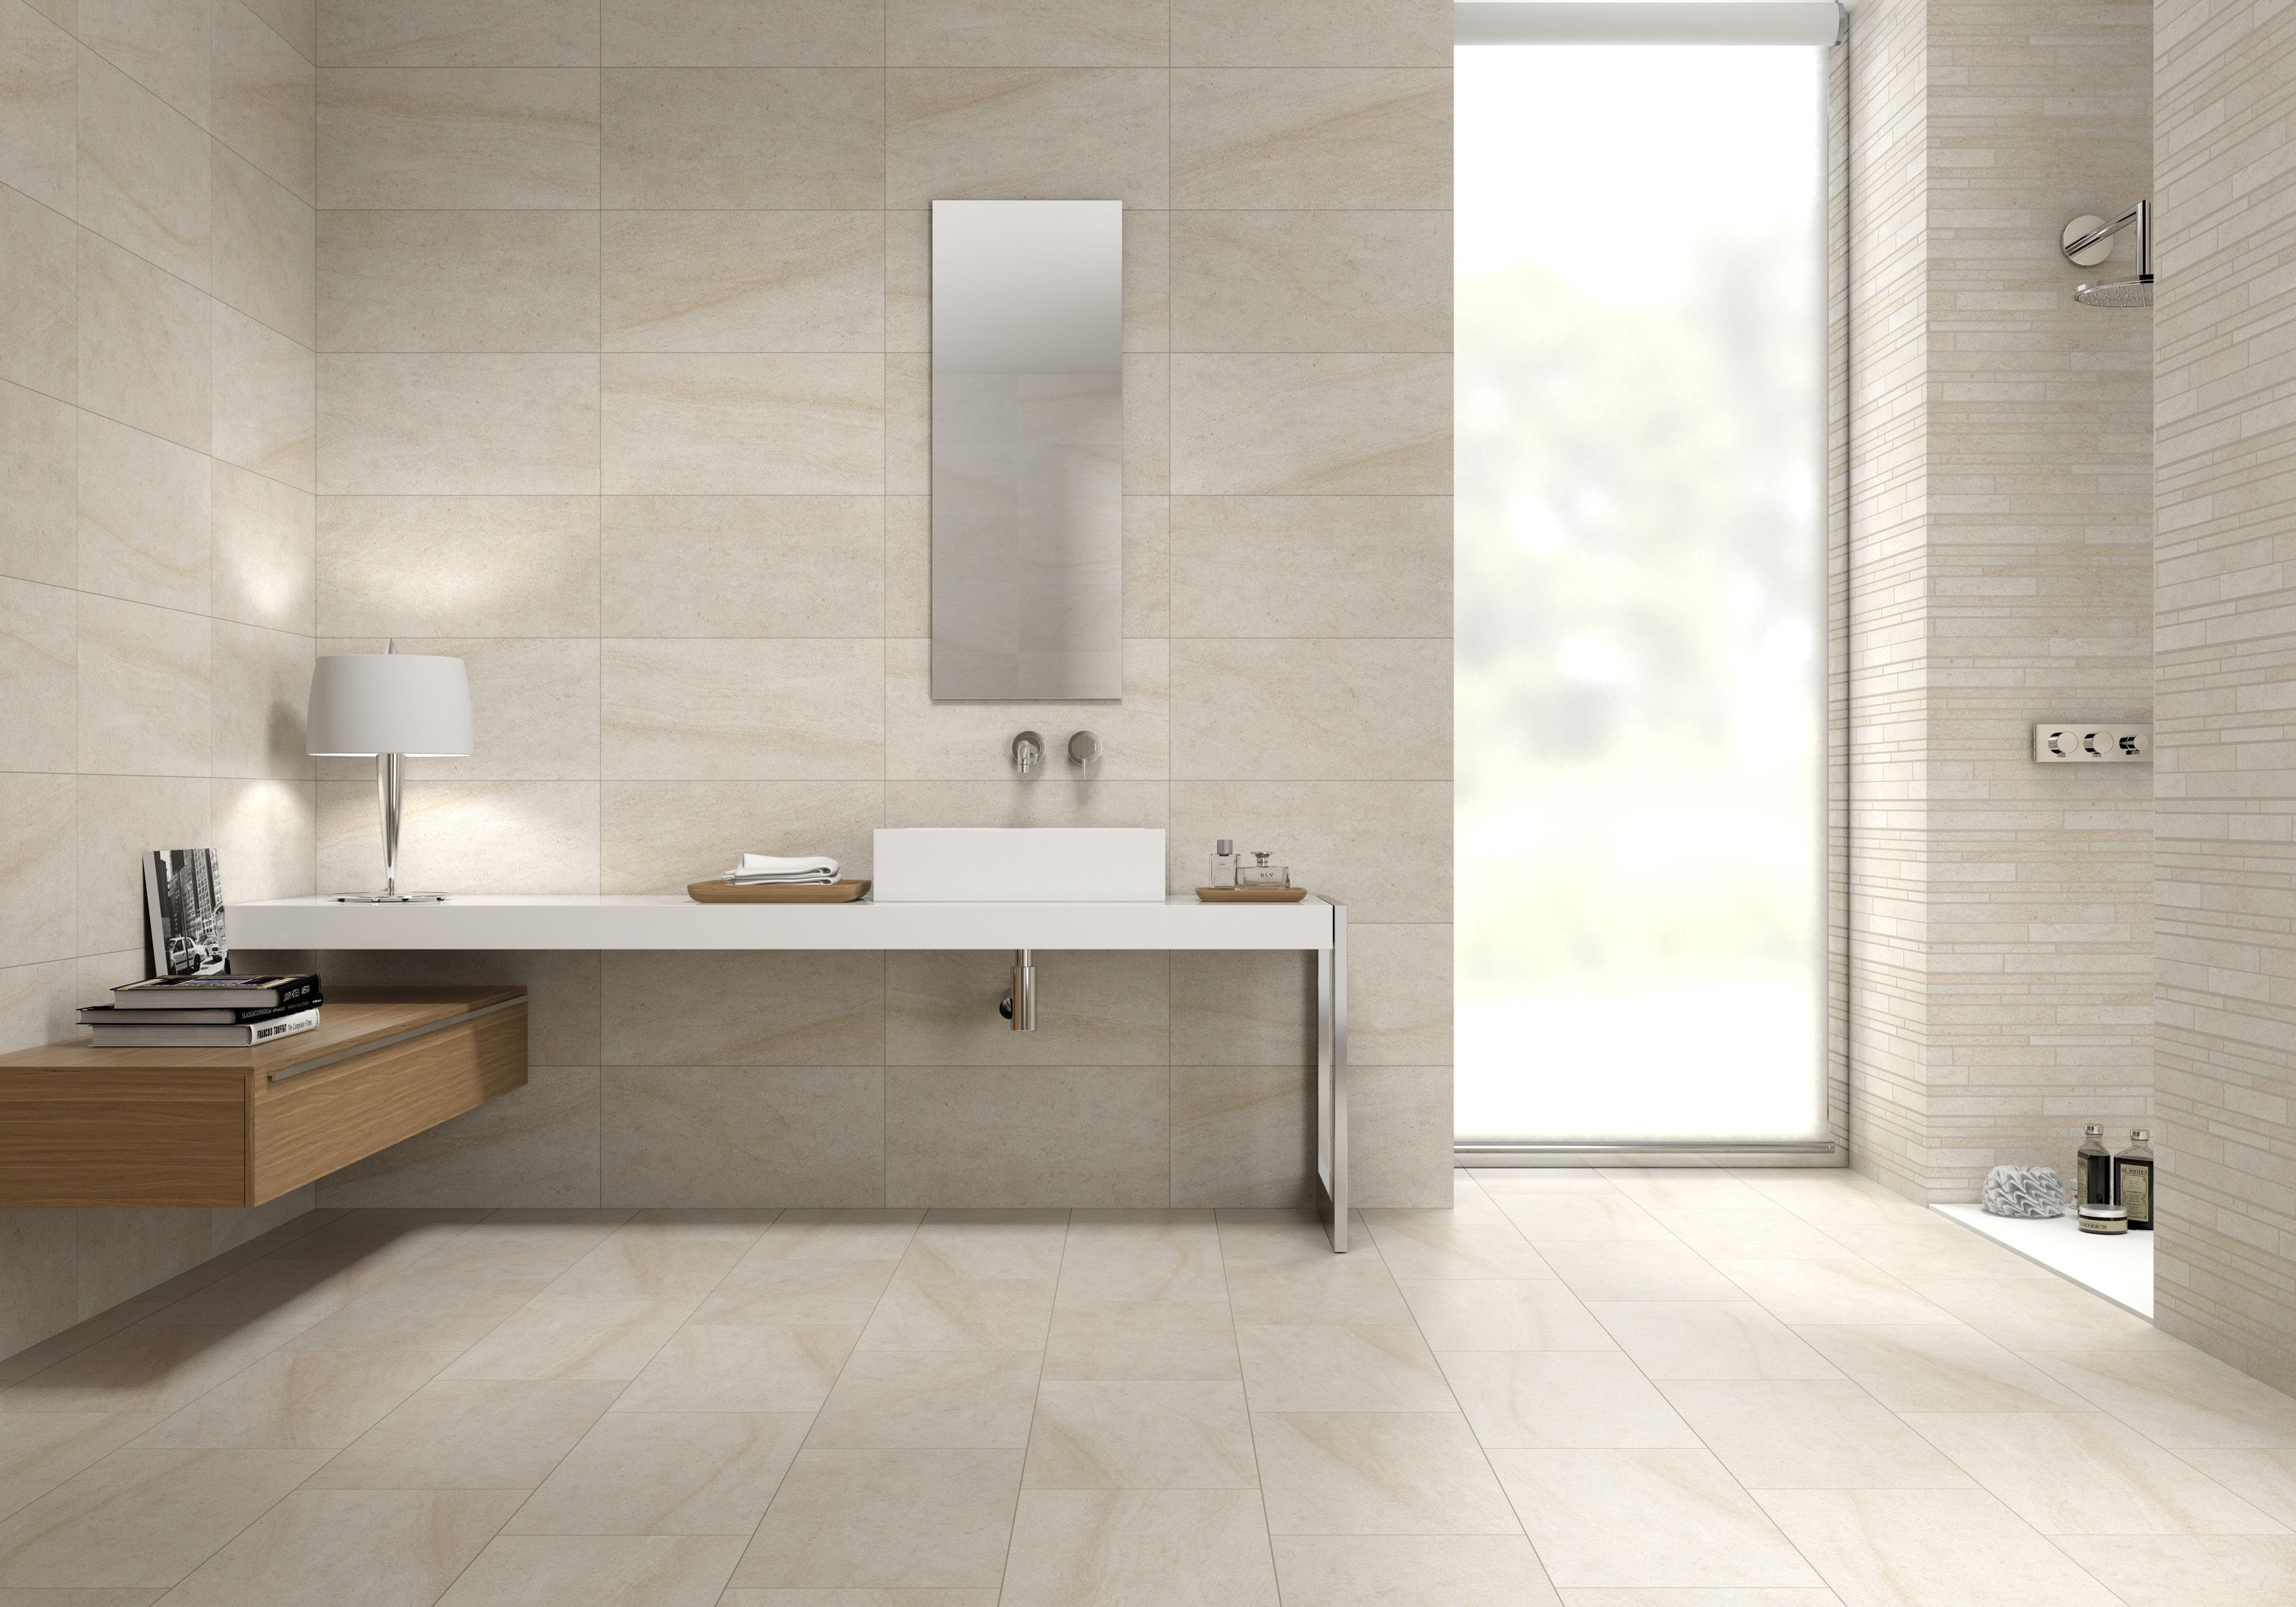 Pin by Elegance Tiles on Bathrooms | Elegance Tiles | Pinterest ...